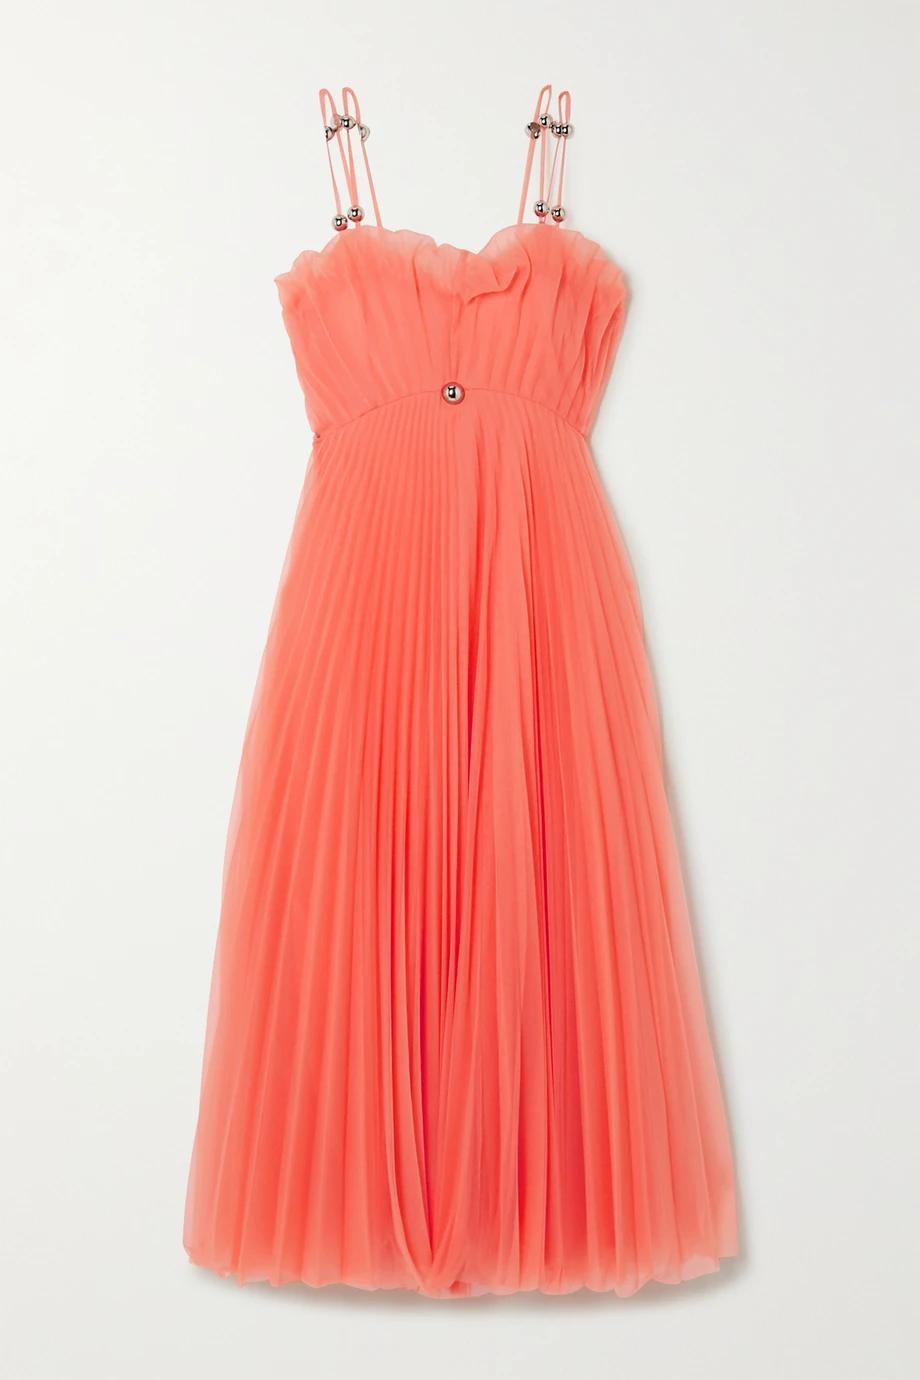 19++ Christopher kane orange dress ideas